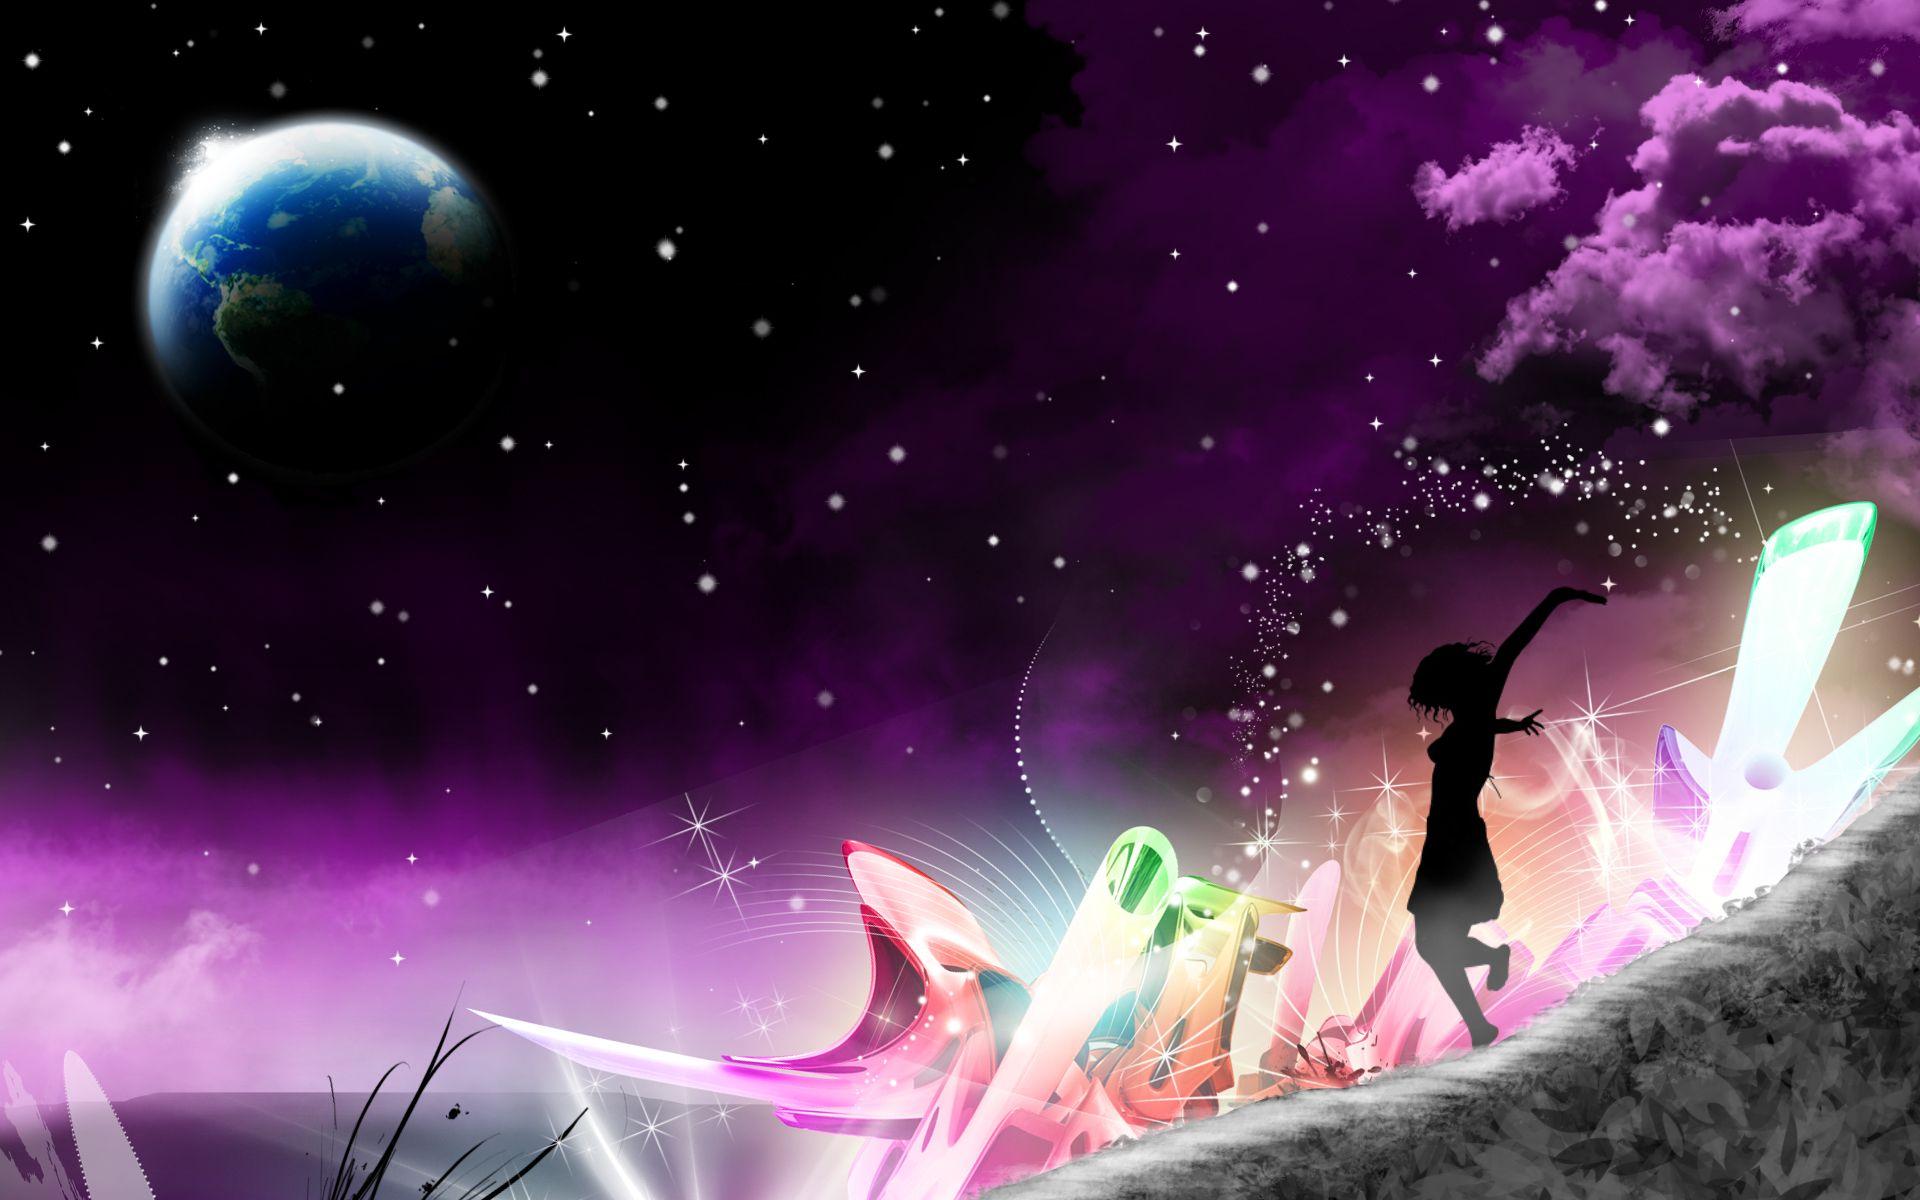 Night Wallpaper No Logo By Ualgreymon On Deviantart: Silhouette D´une Fille